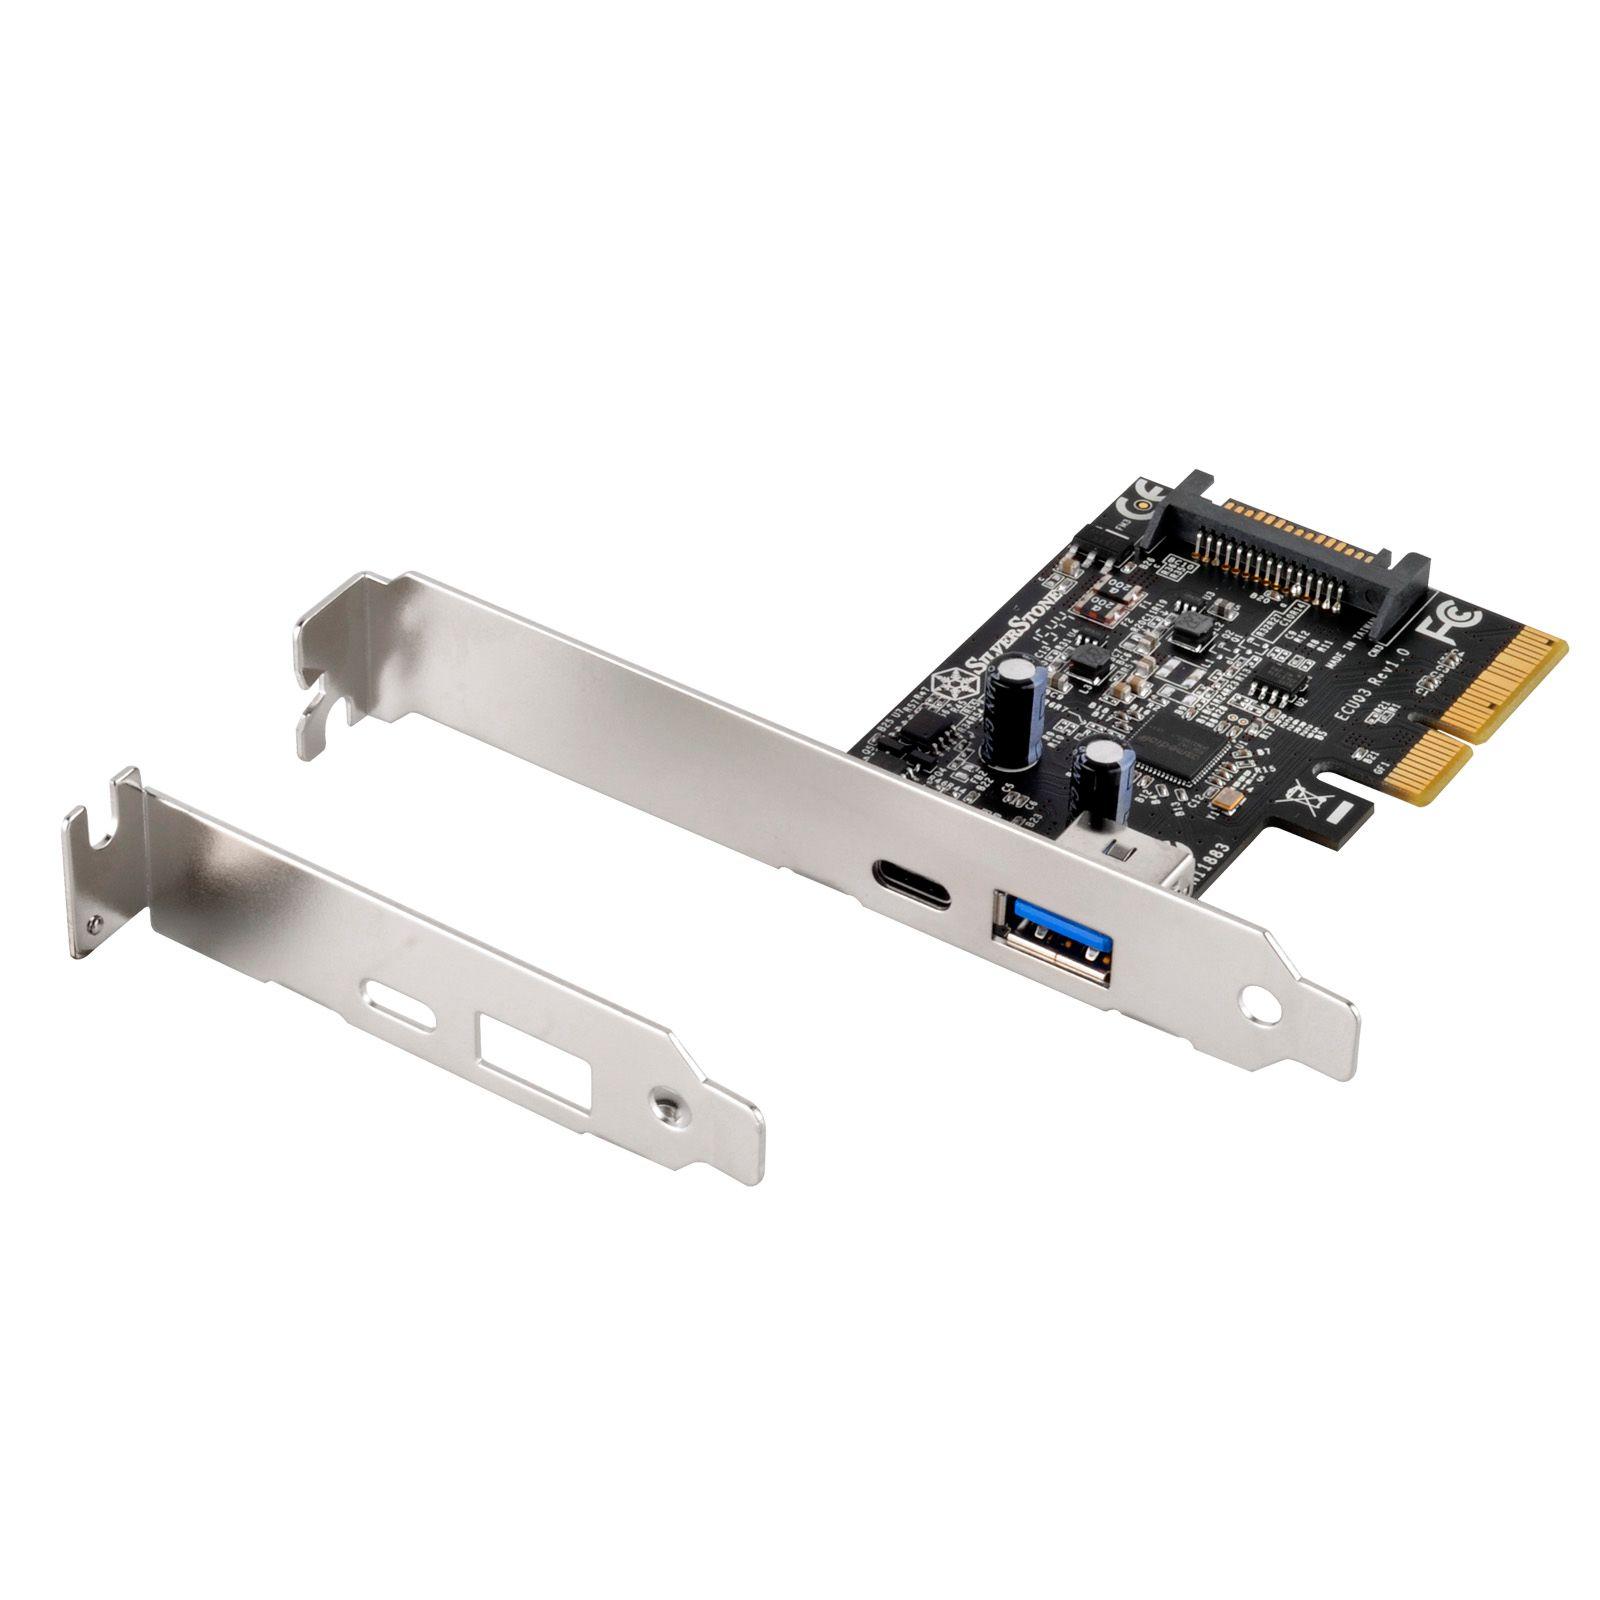 SILVERSTONE 2 PORT USB3.1 GEN2 PCIE EXPANSION CARD SST-ECU03